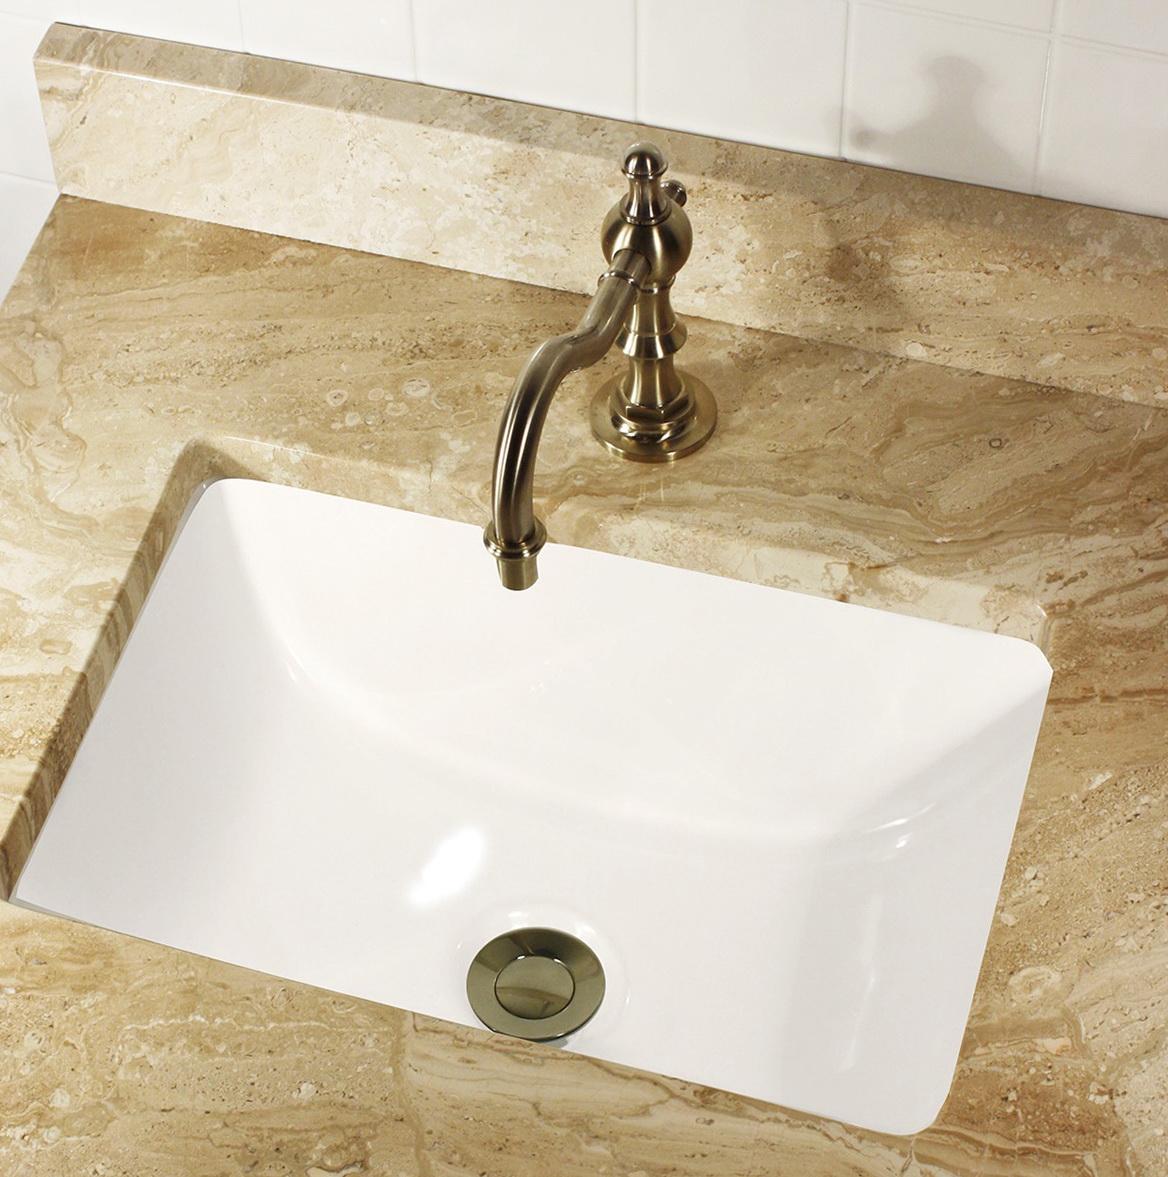 Small Bathroom Sinks Undermount